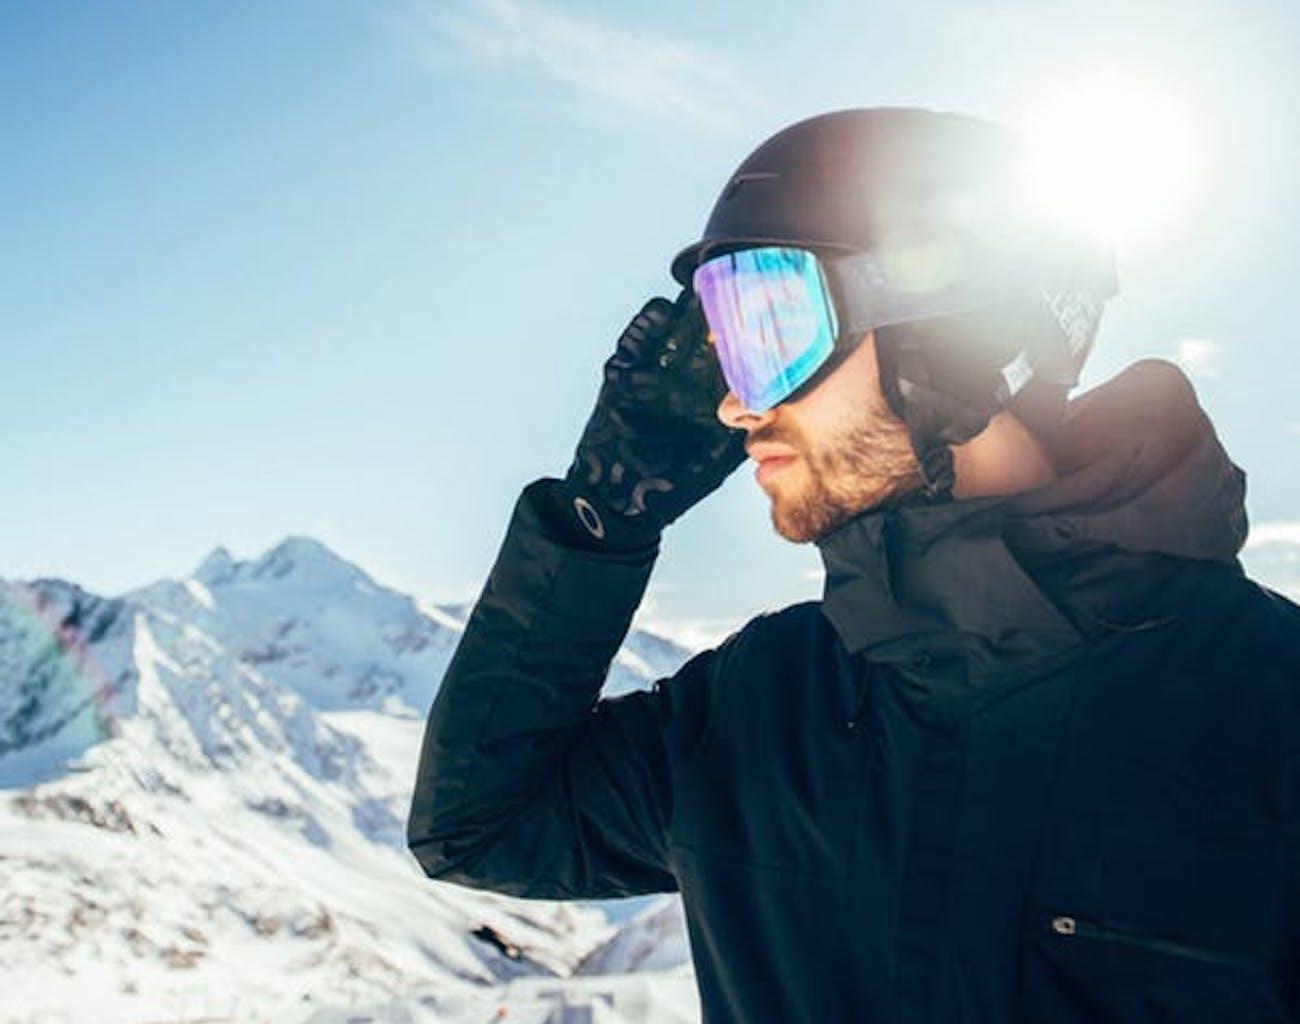 Blueprint Eyewear BSG3 Interchangeable Lens Snow Goggles